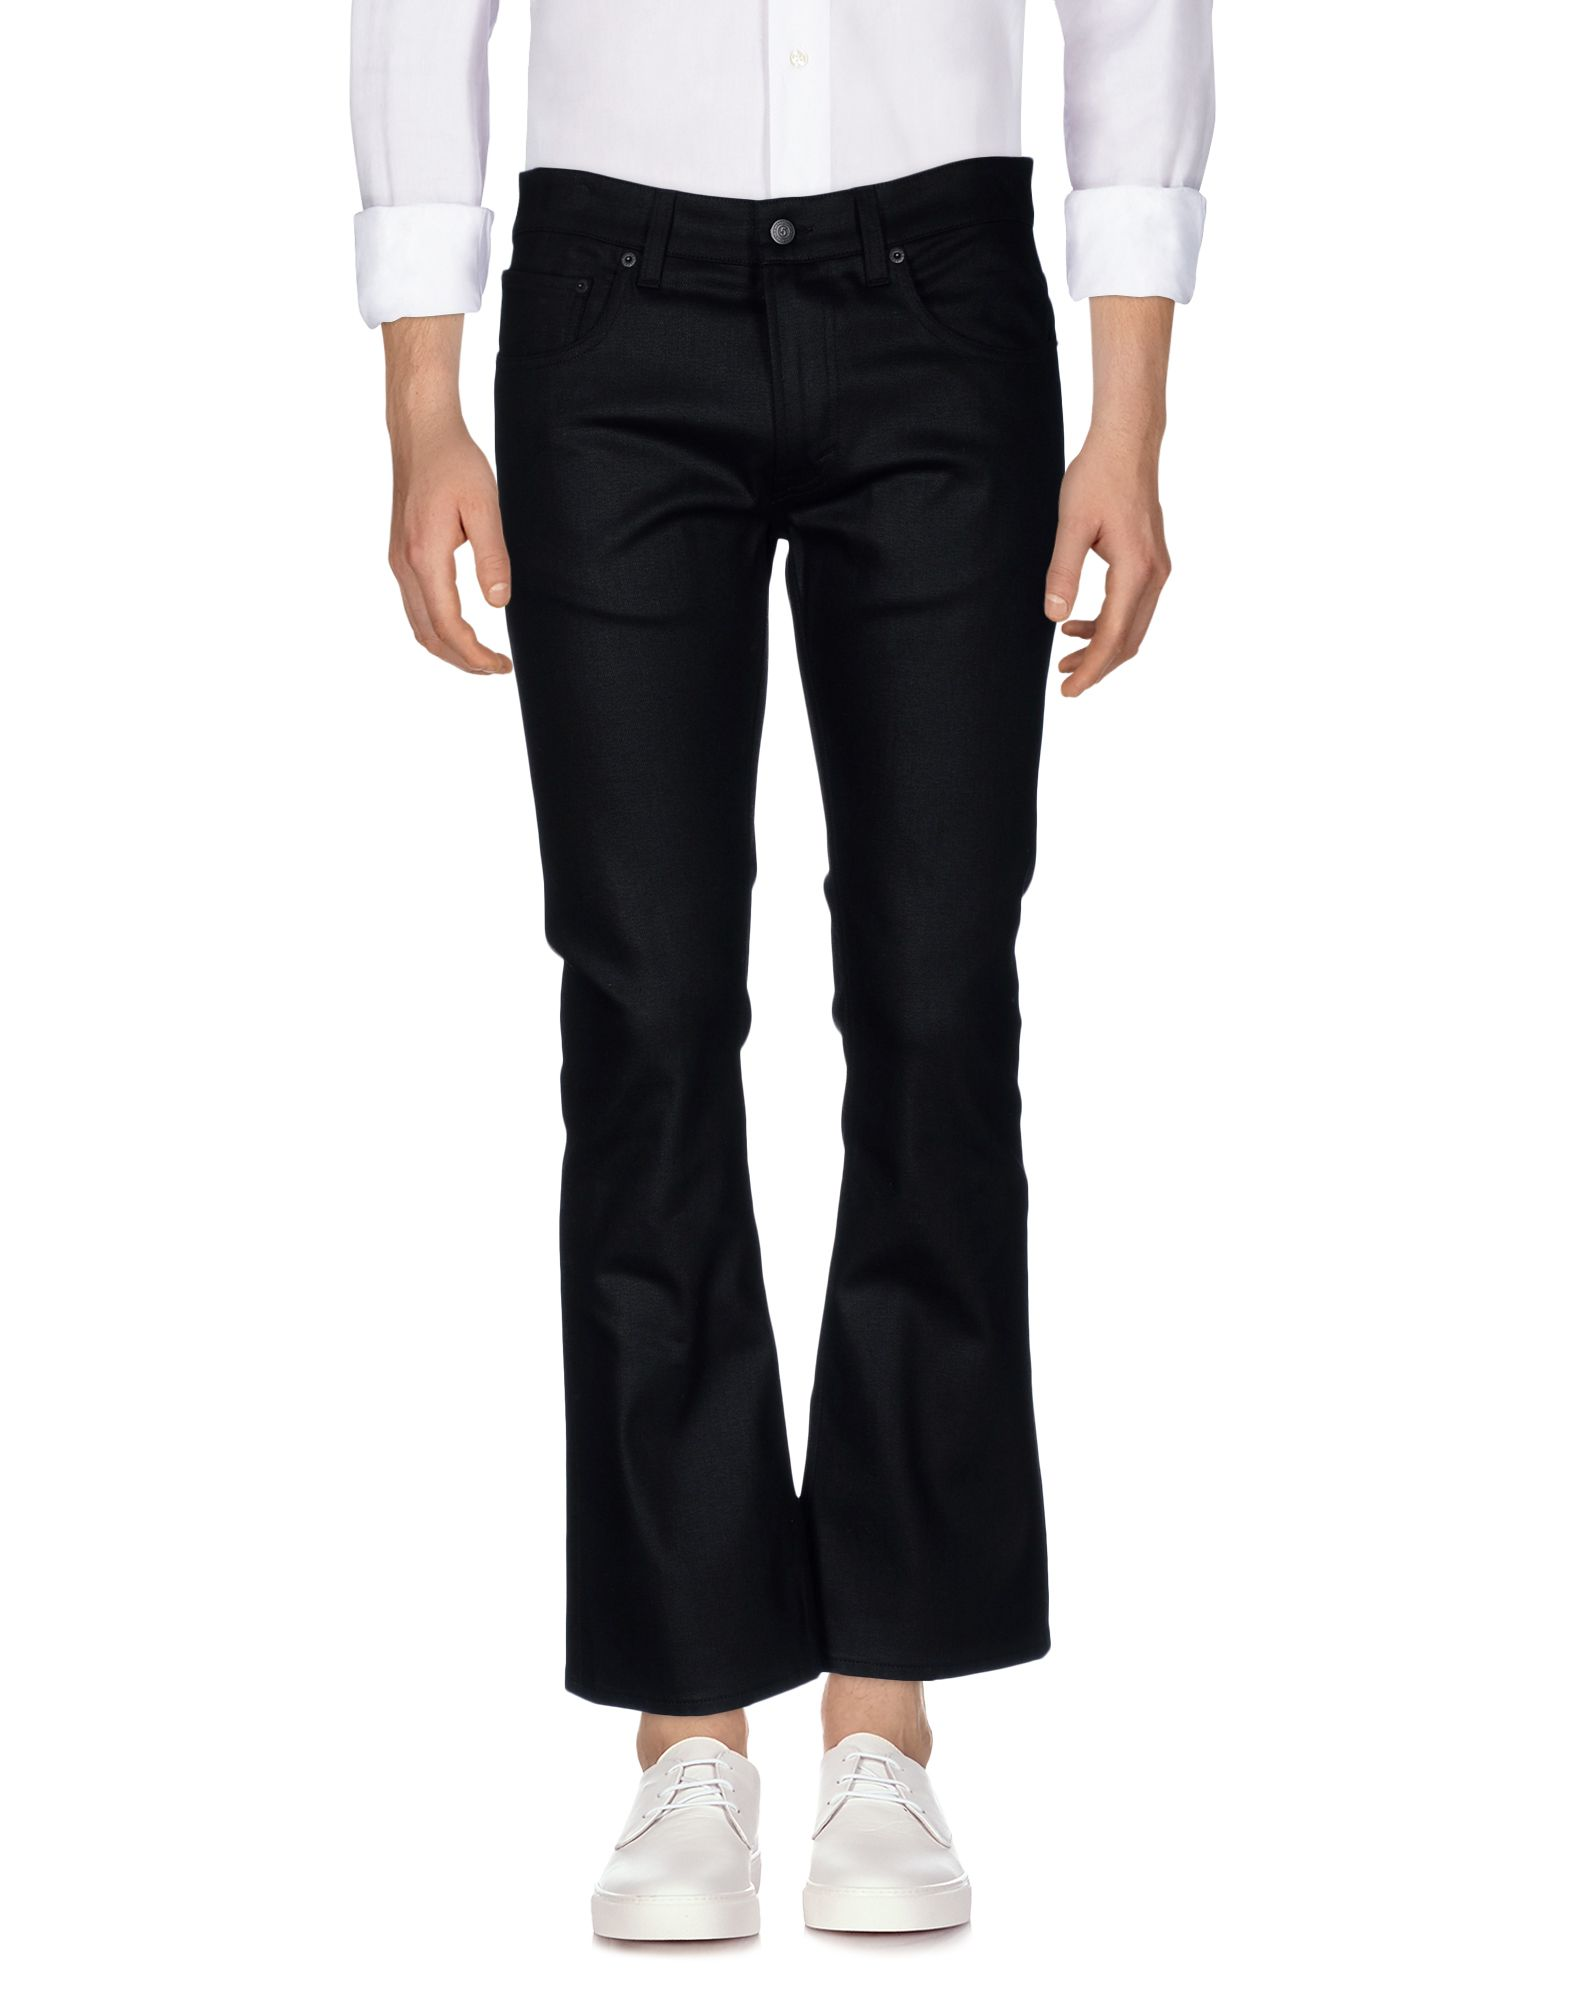 Donna Department Pantaloni online 5 Jeans Acquista su BgFRf